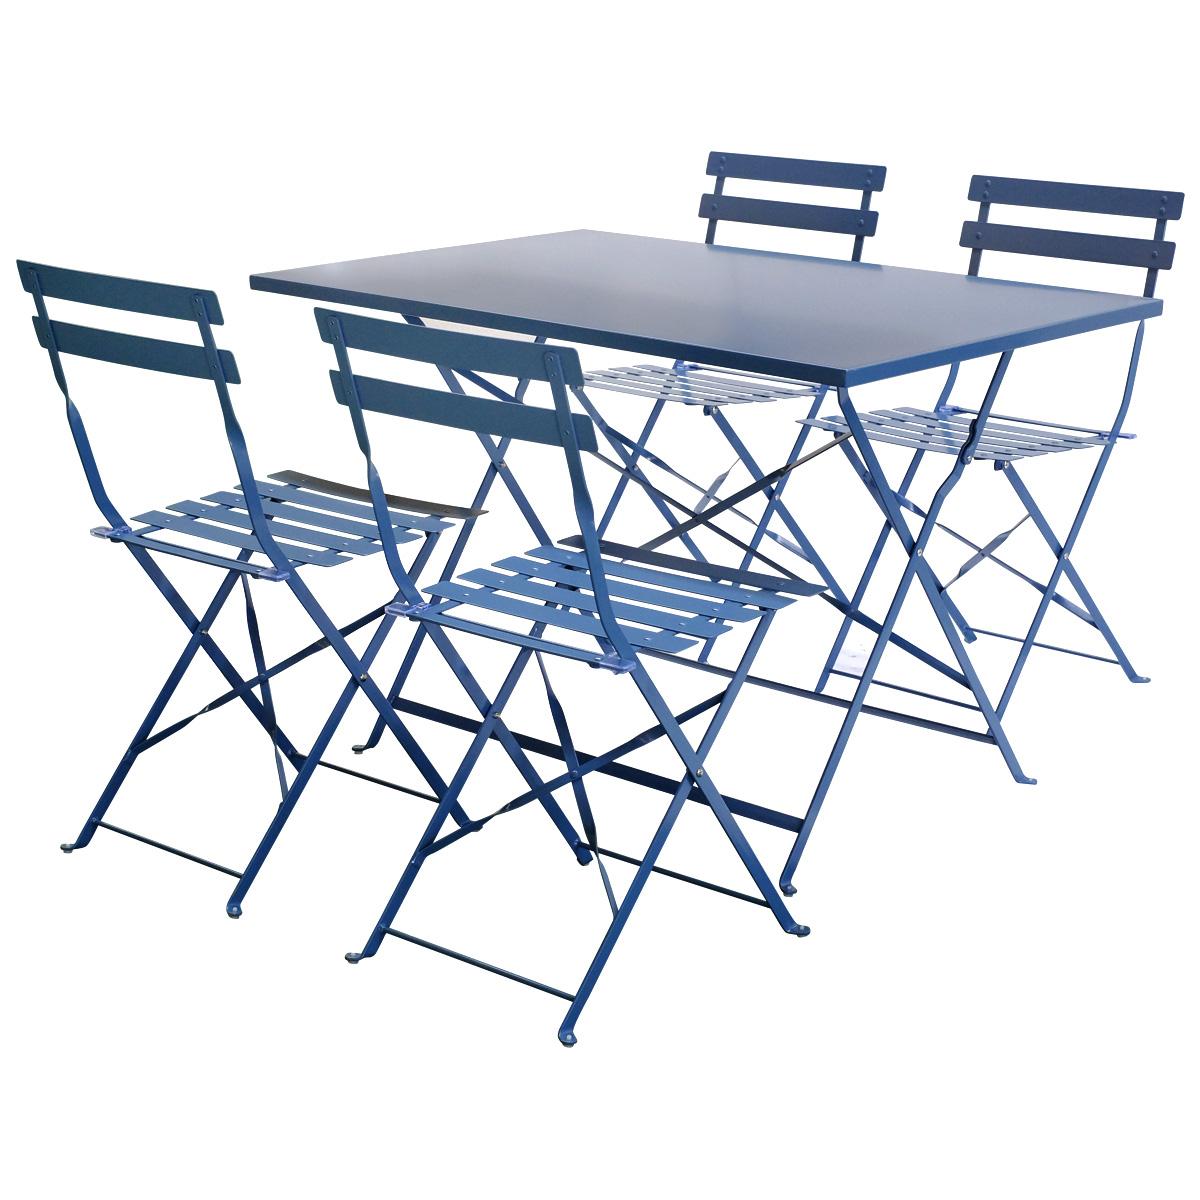 Charles-BENTLEY-4-asientos-rectangular-plegable-de-metal-conjunto-de-Comedor-Naranja-Azul-Marino